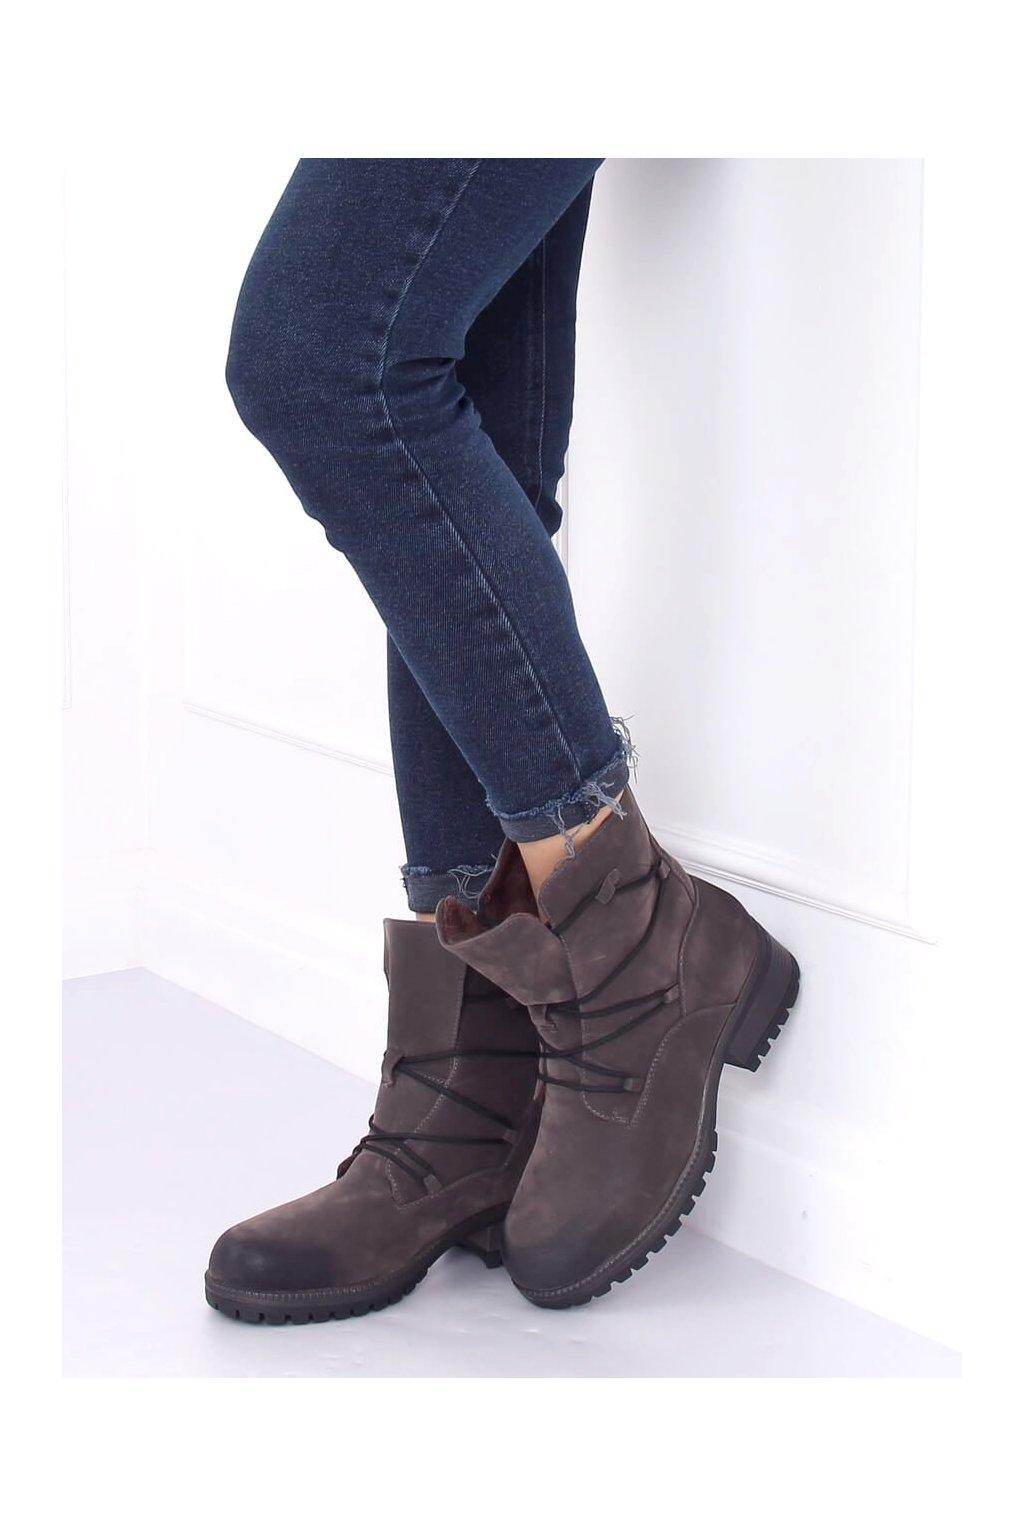 Dámske členkové topánky sivé na širokom podpätku K1936104